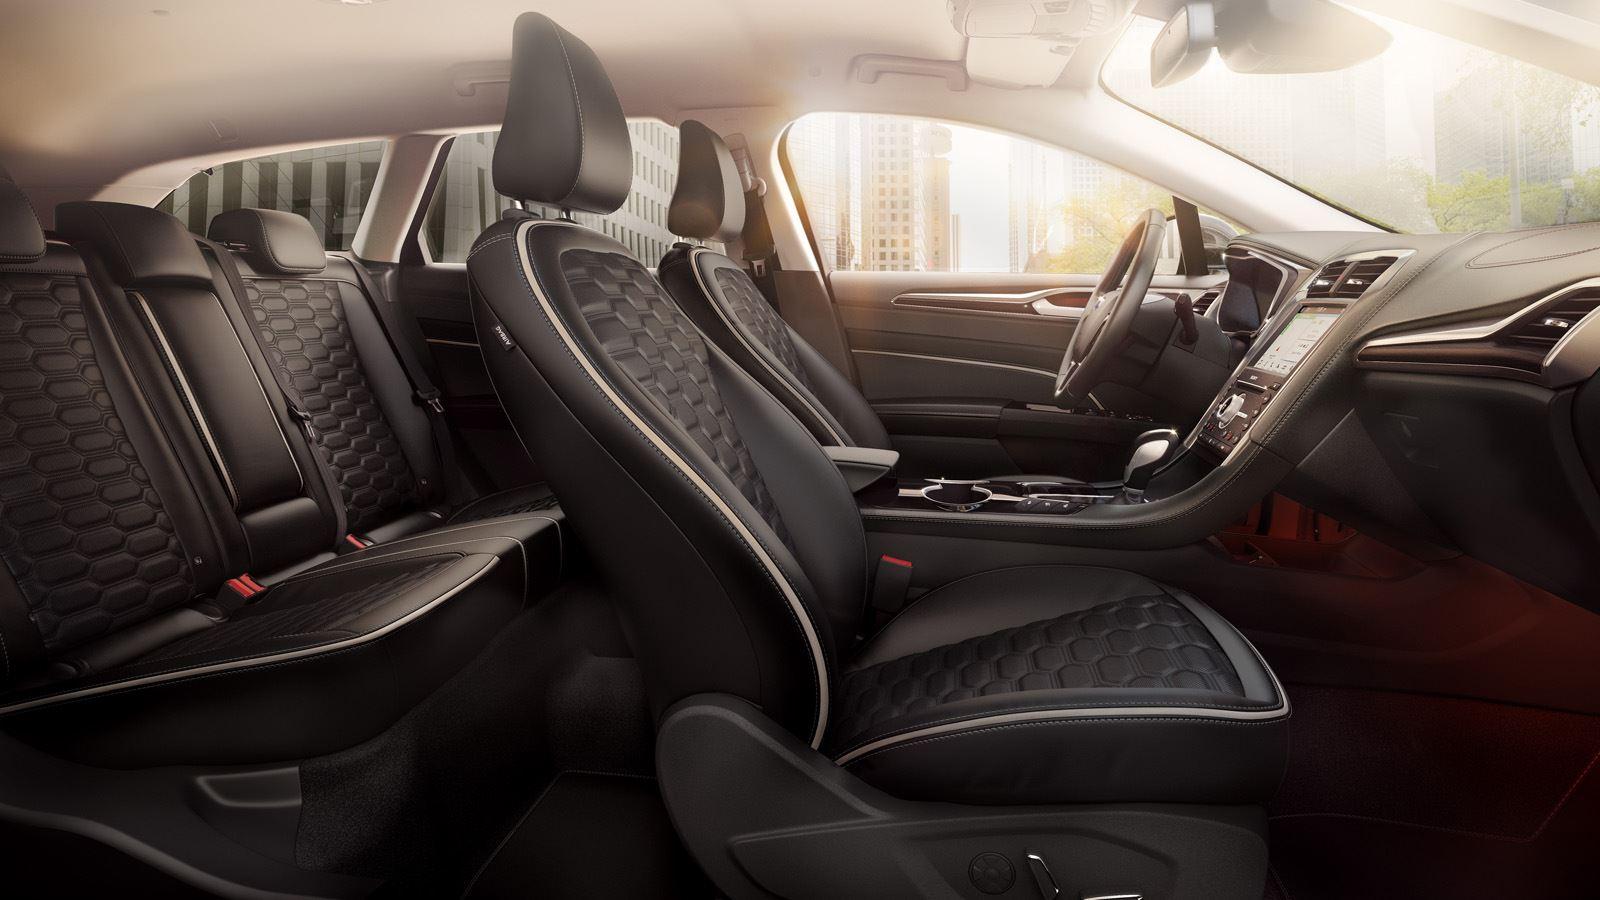 Ford Mondeo Hybrid Wagon interieurfoto1 1600x900px